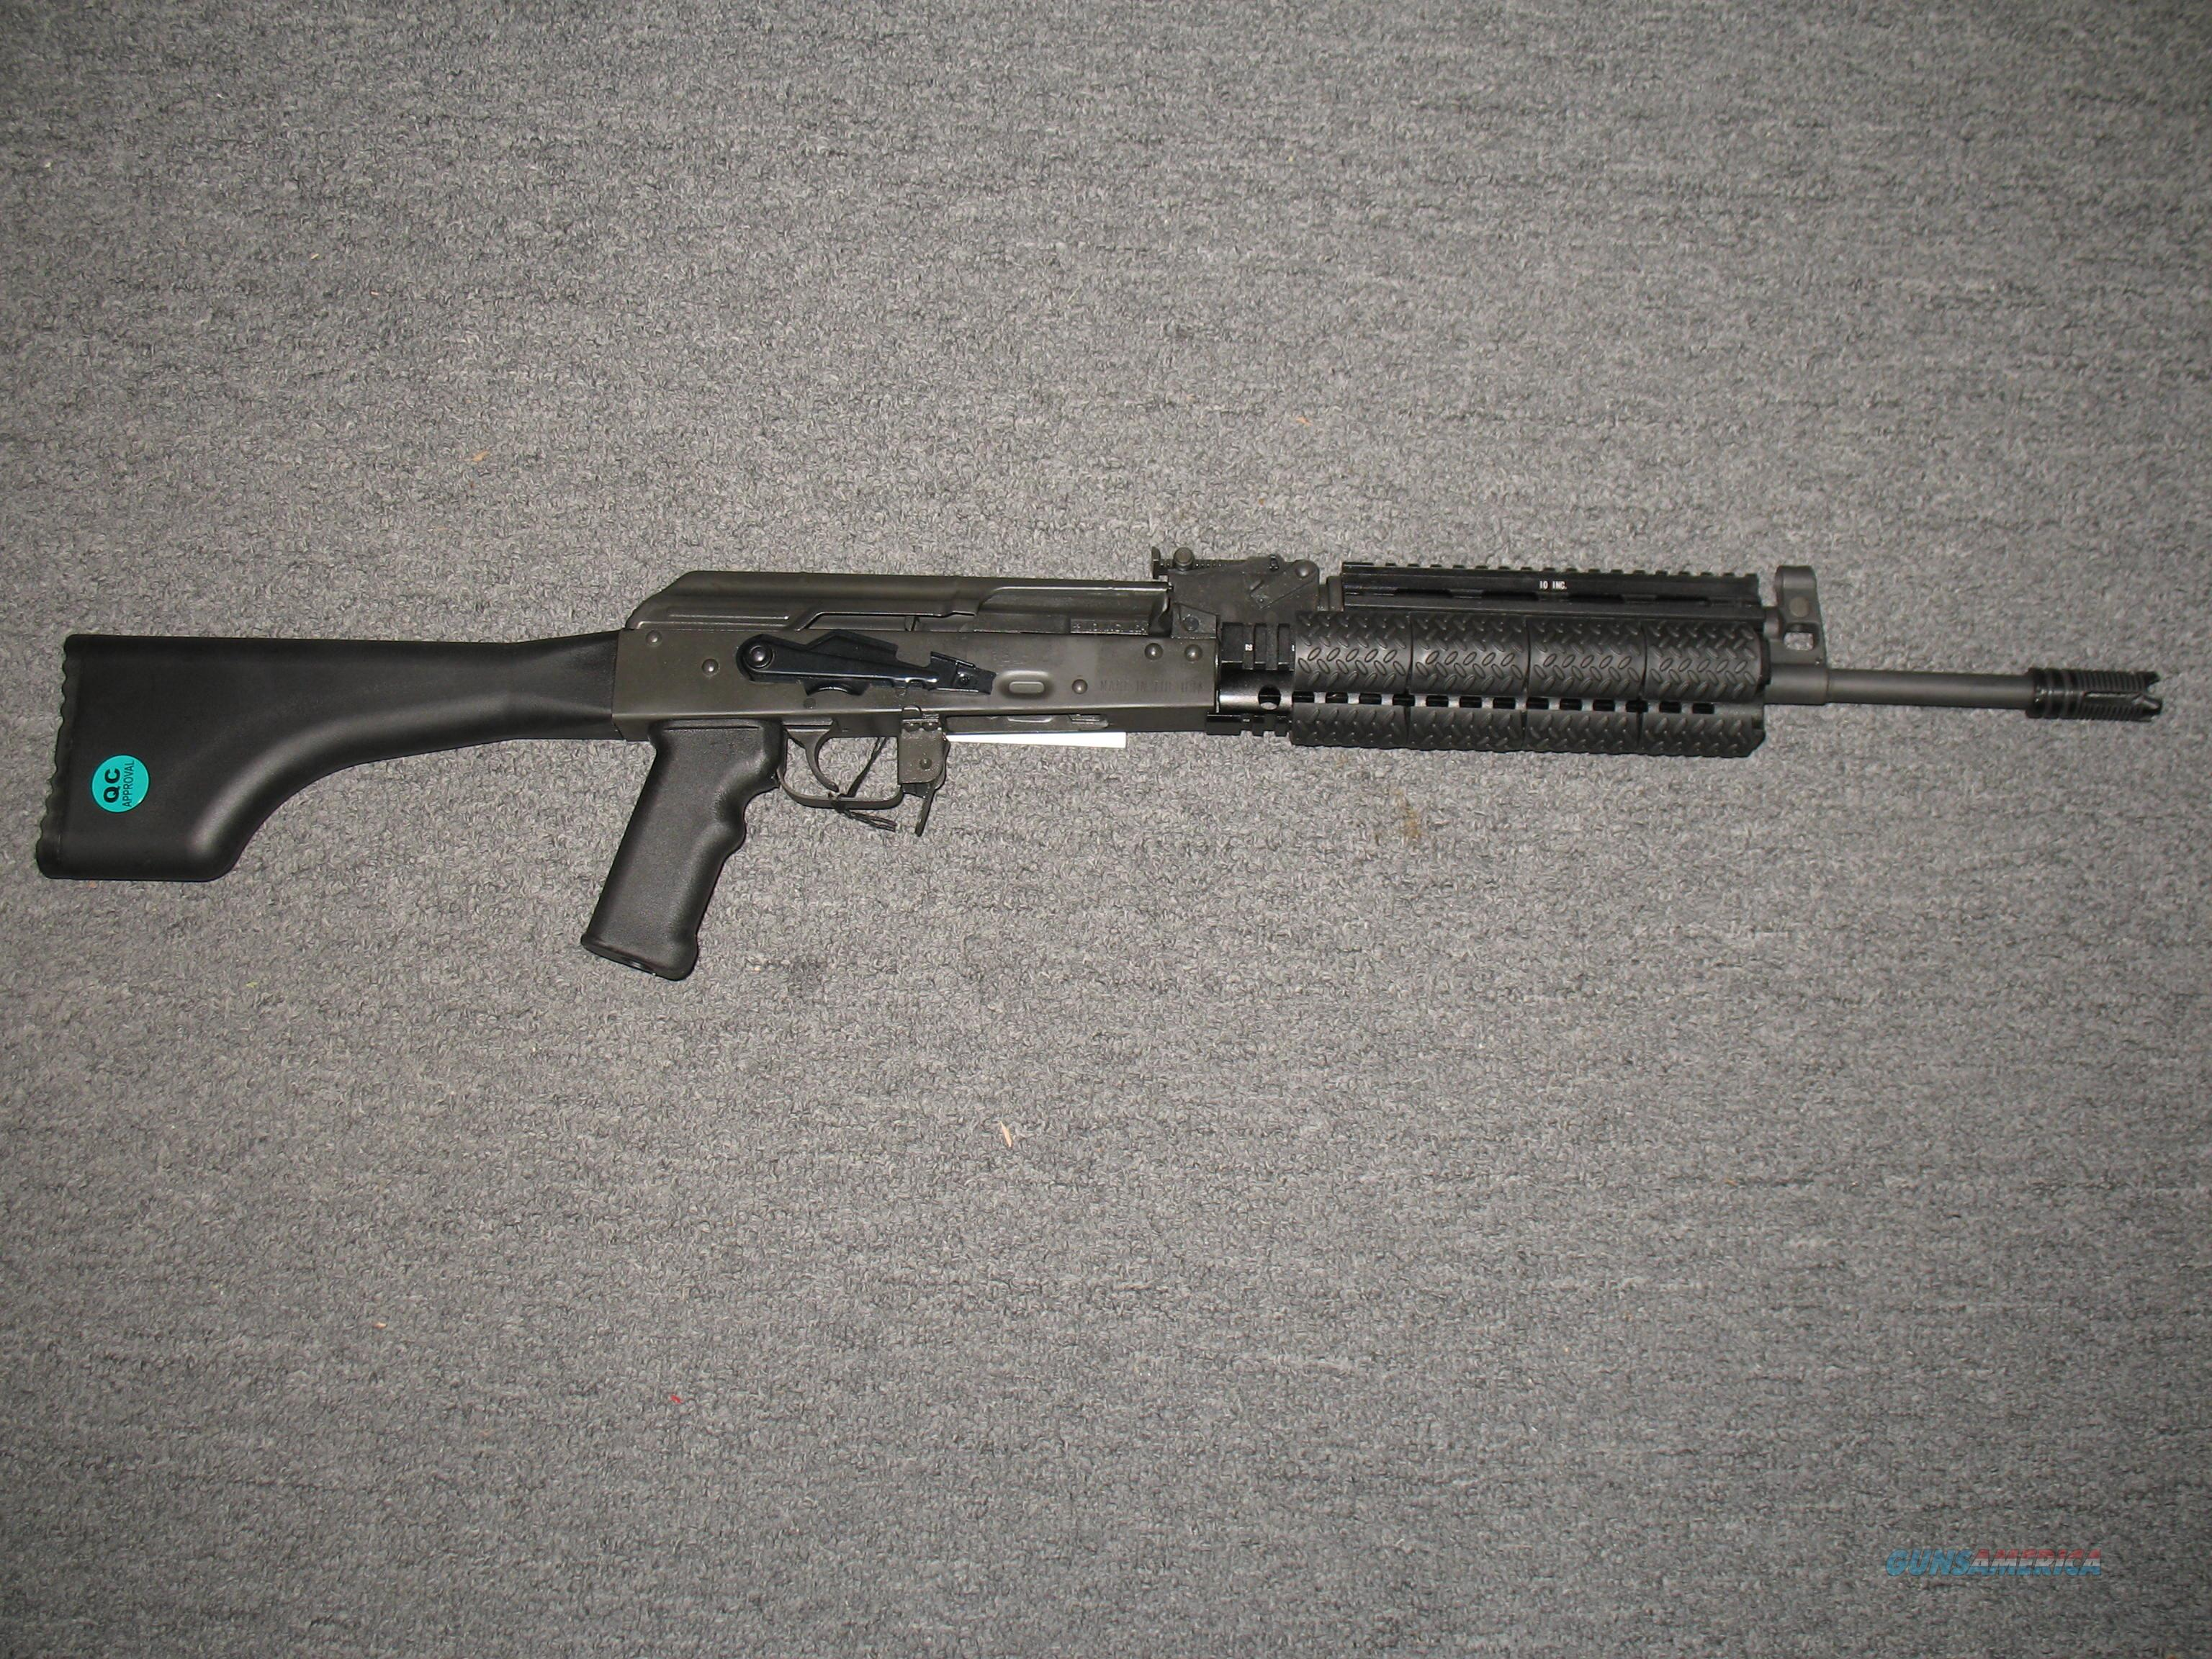 I.O. Inc. Sporter  Guns > Rifles > AK-47 Rifles (and copies) > Full Stock